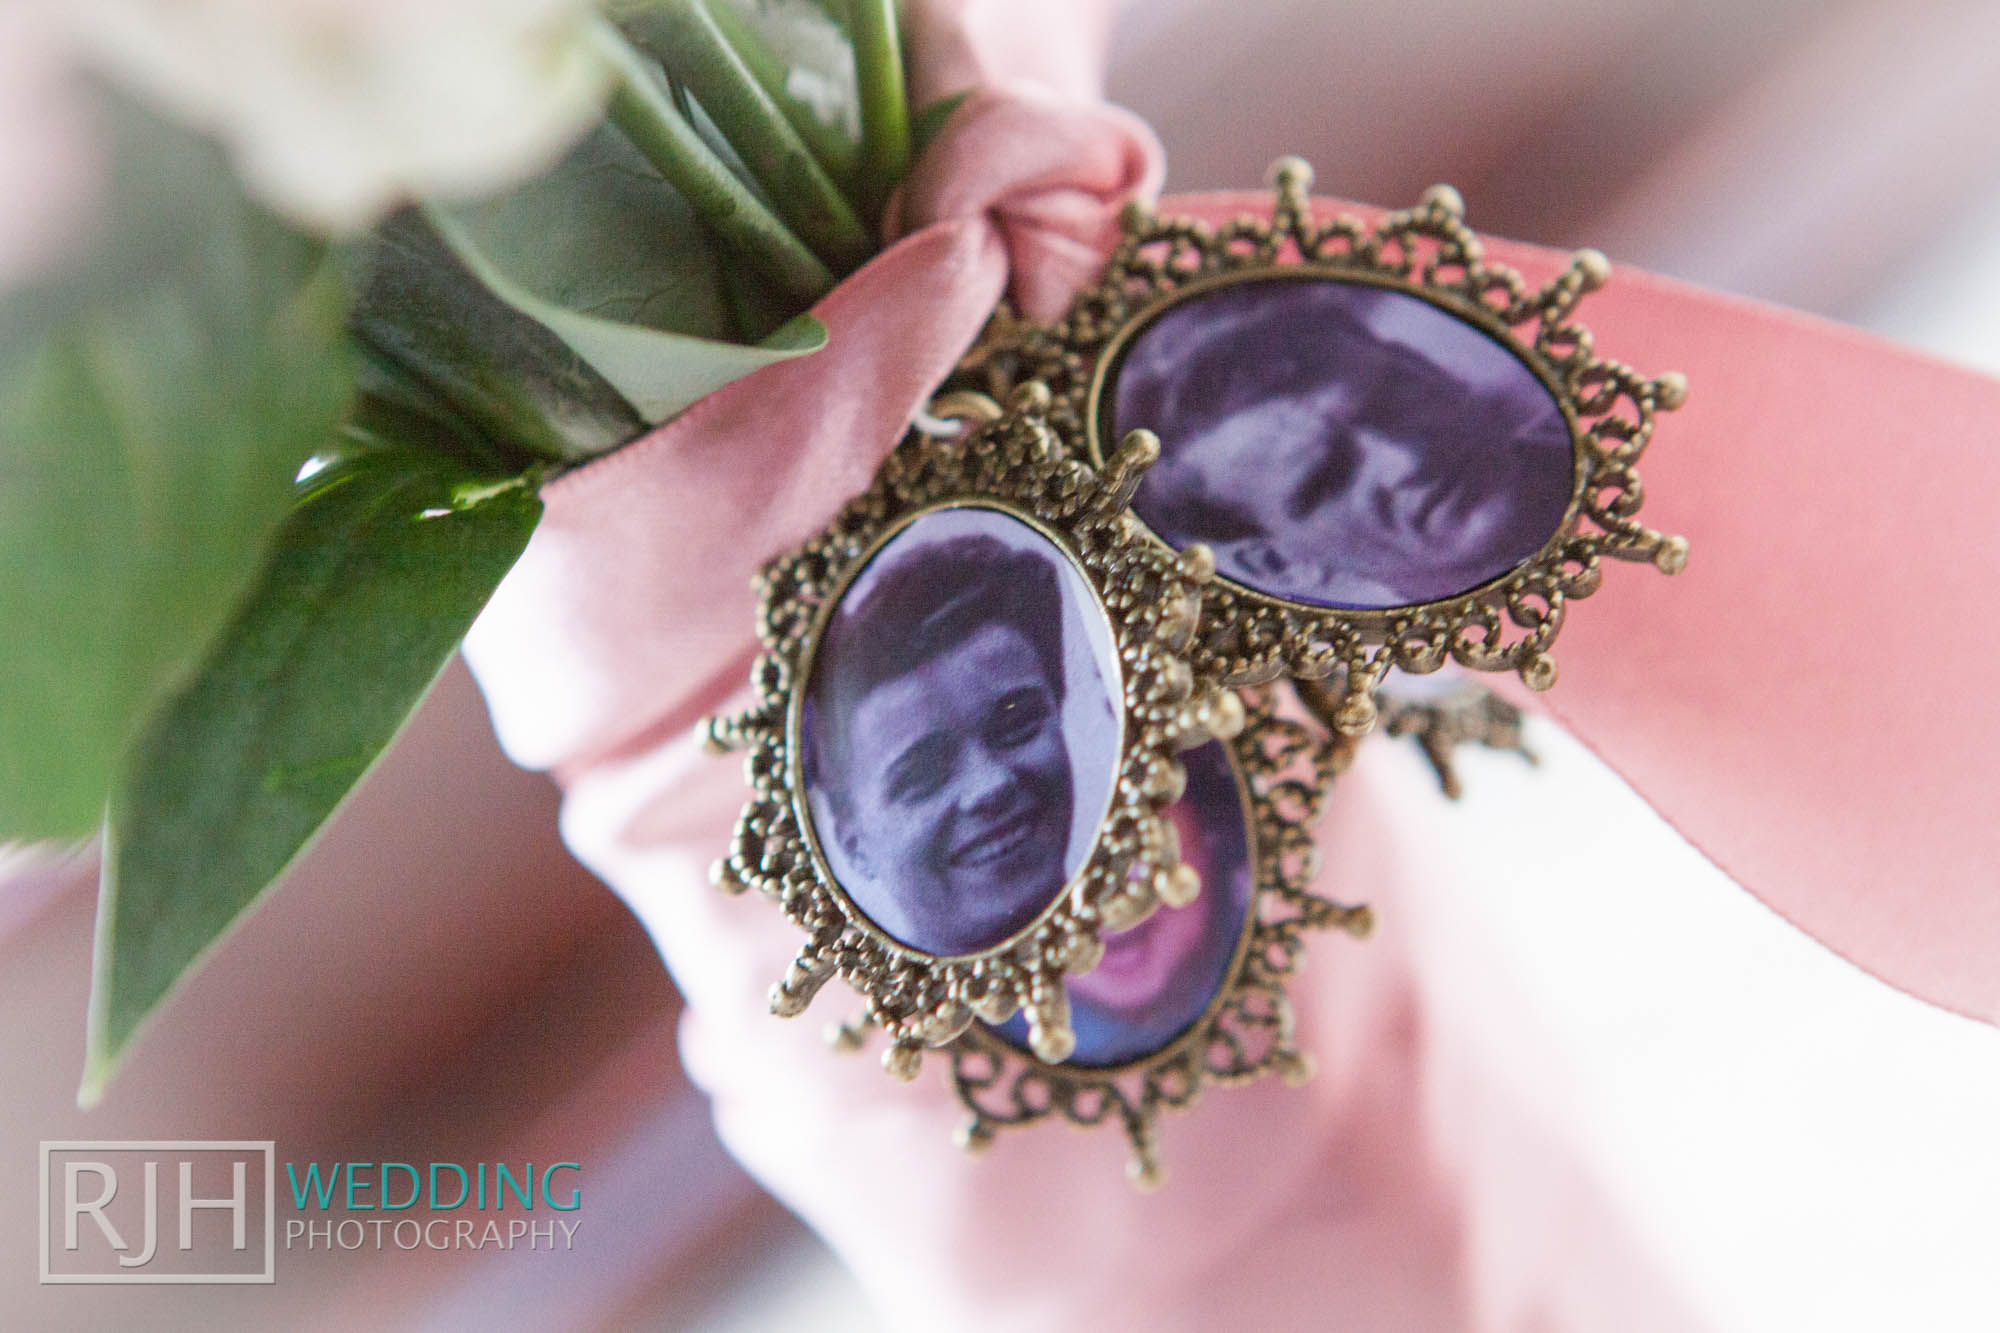 RJH Wedding Photography_2014 highlights_34.jpg